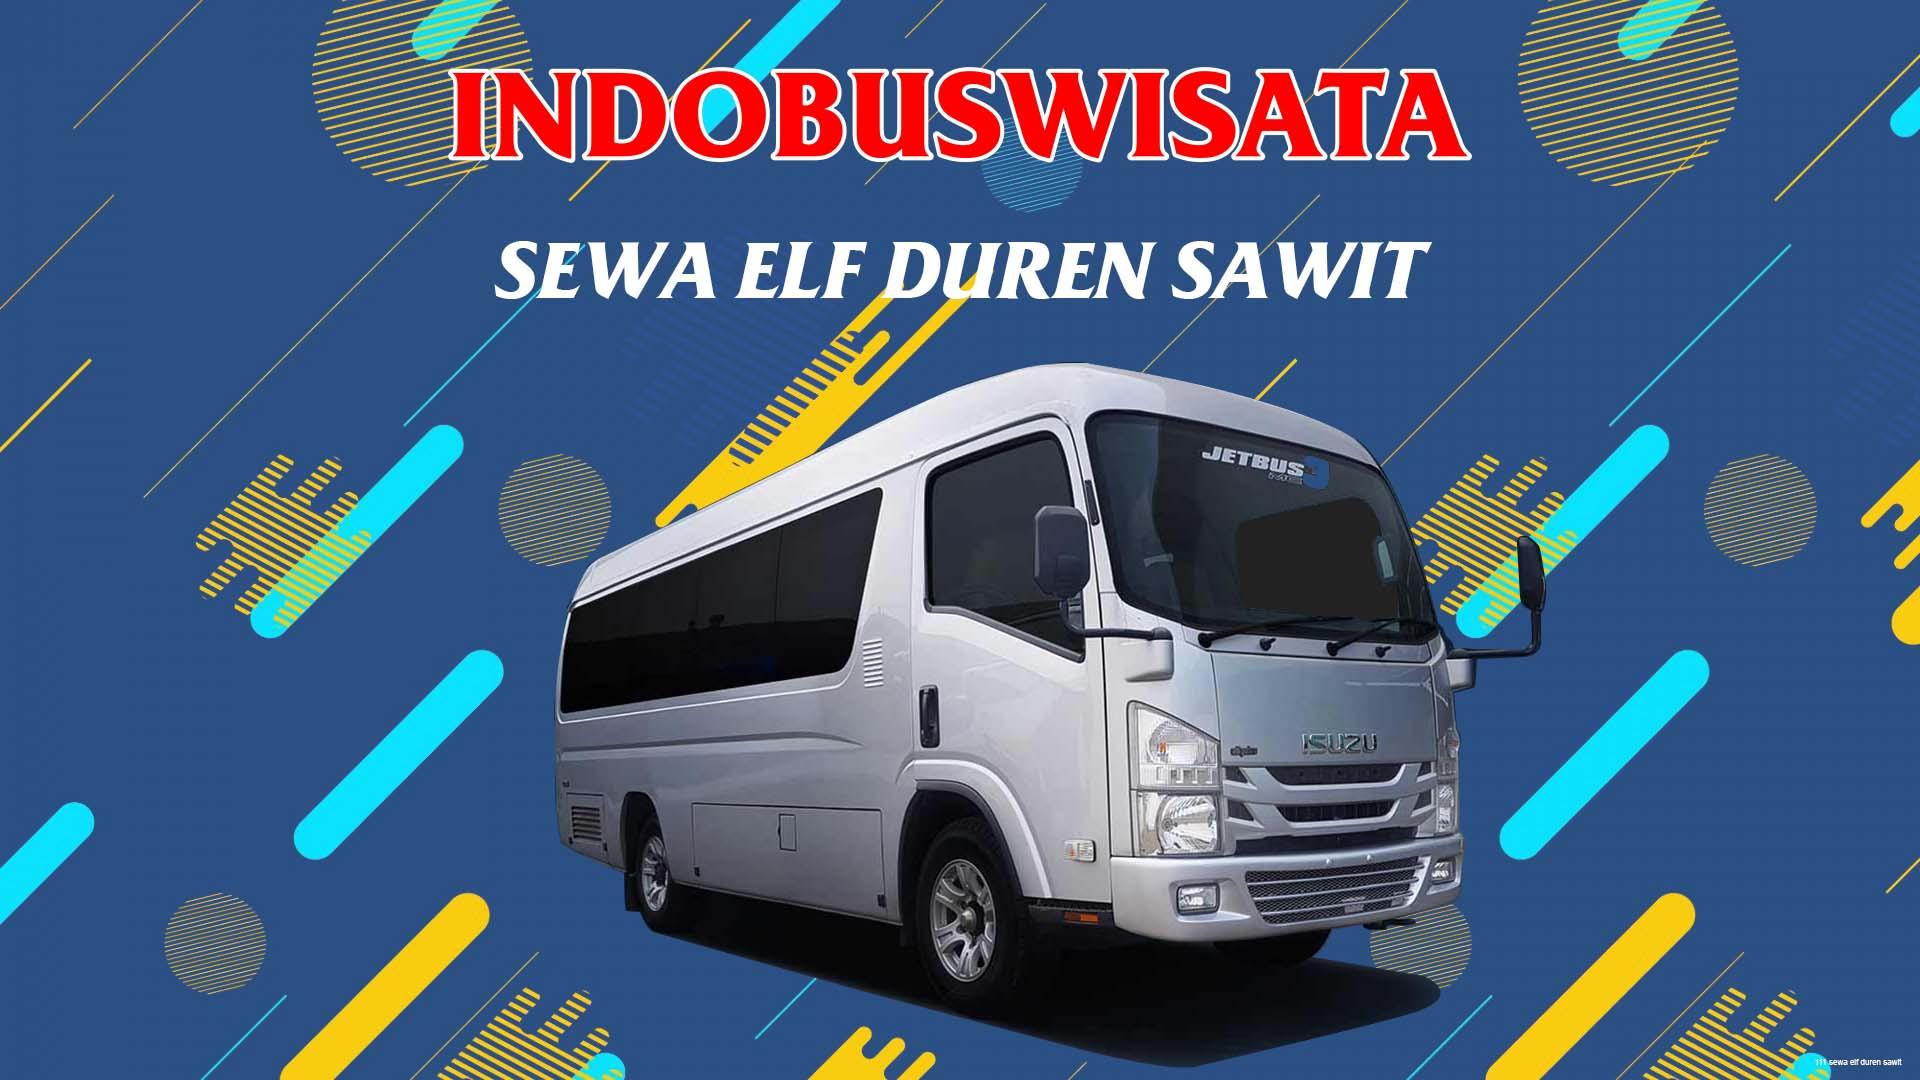 111 Sewa Elf Duren Sawit Indobuswisata